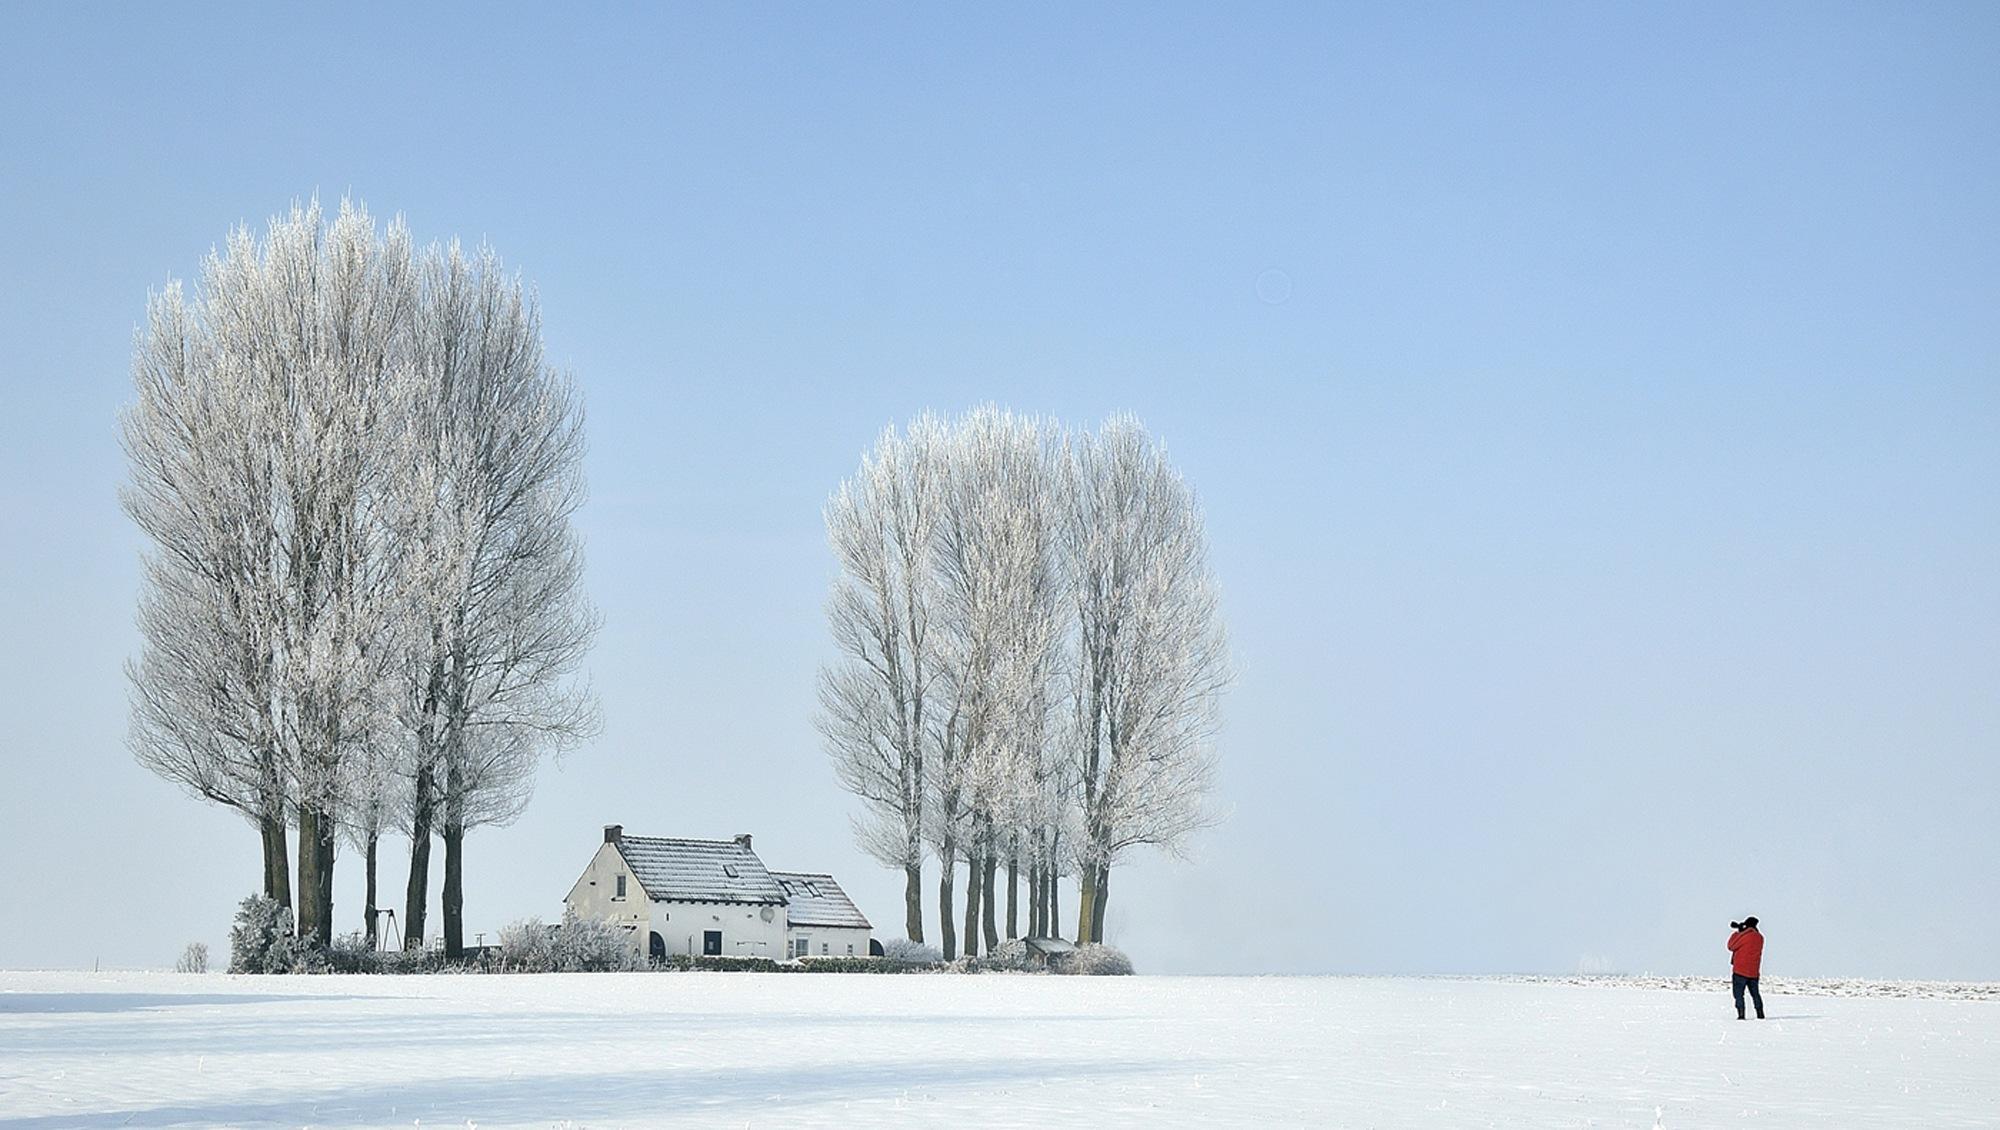 Winter in Zeeland by Rudi.Fonteijne